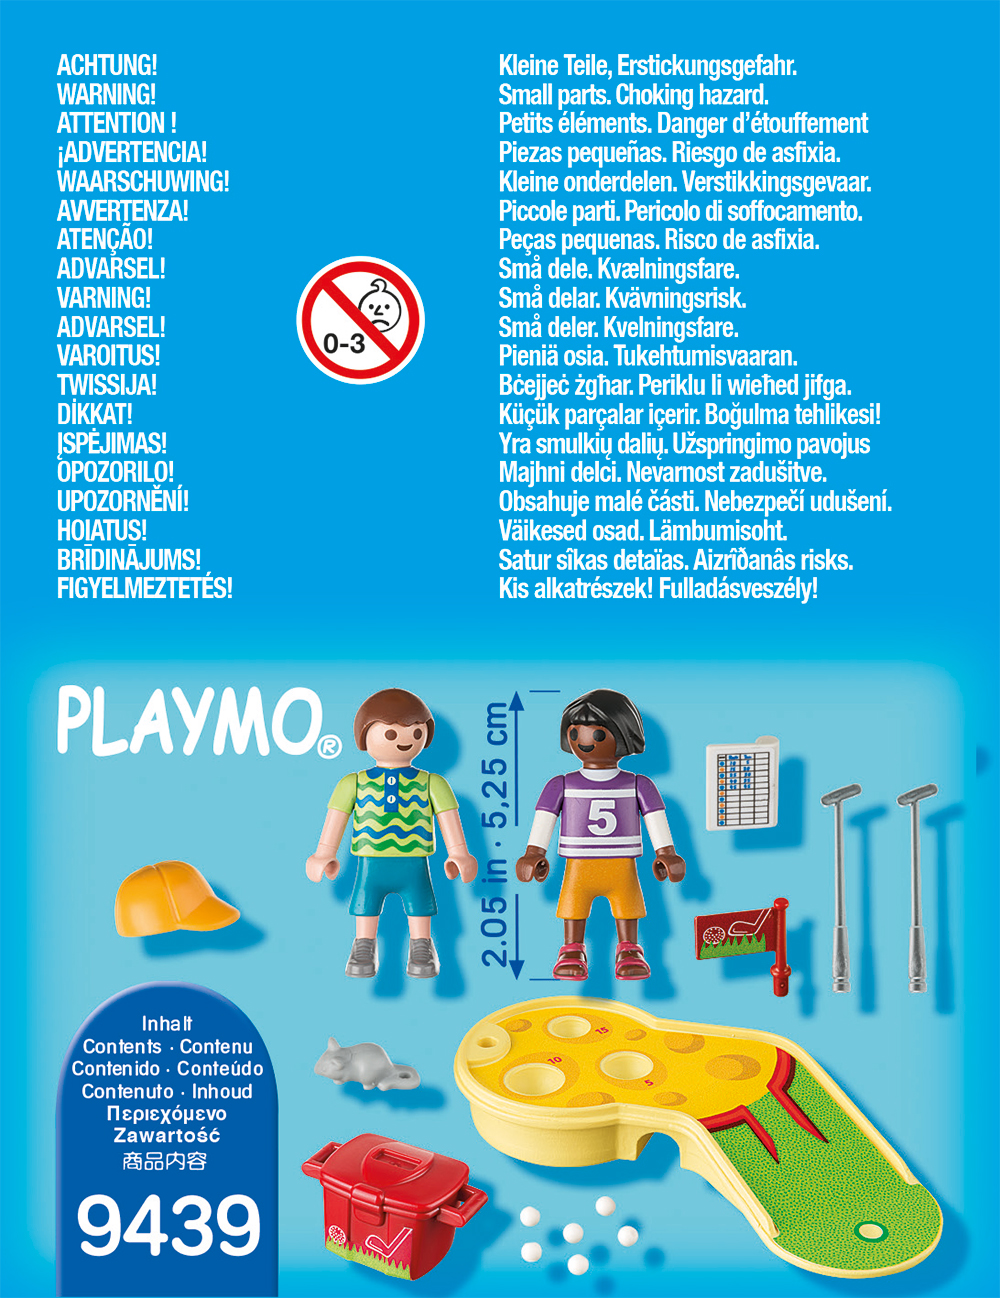 Figurine jucand minigolf playmobil - 1